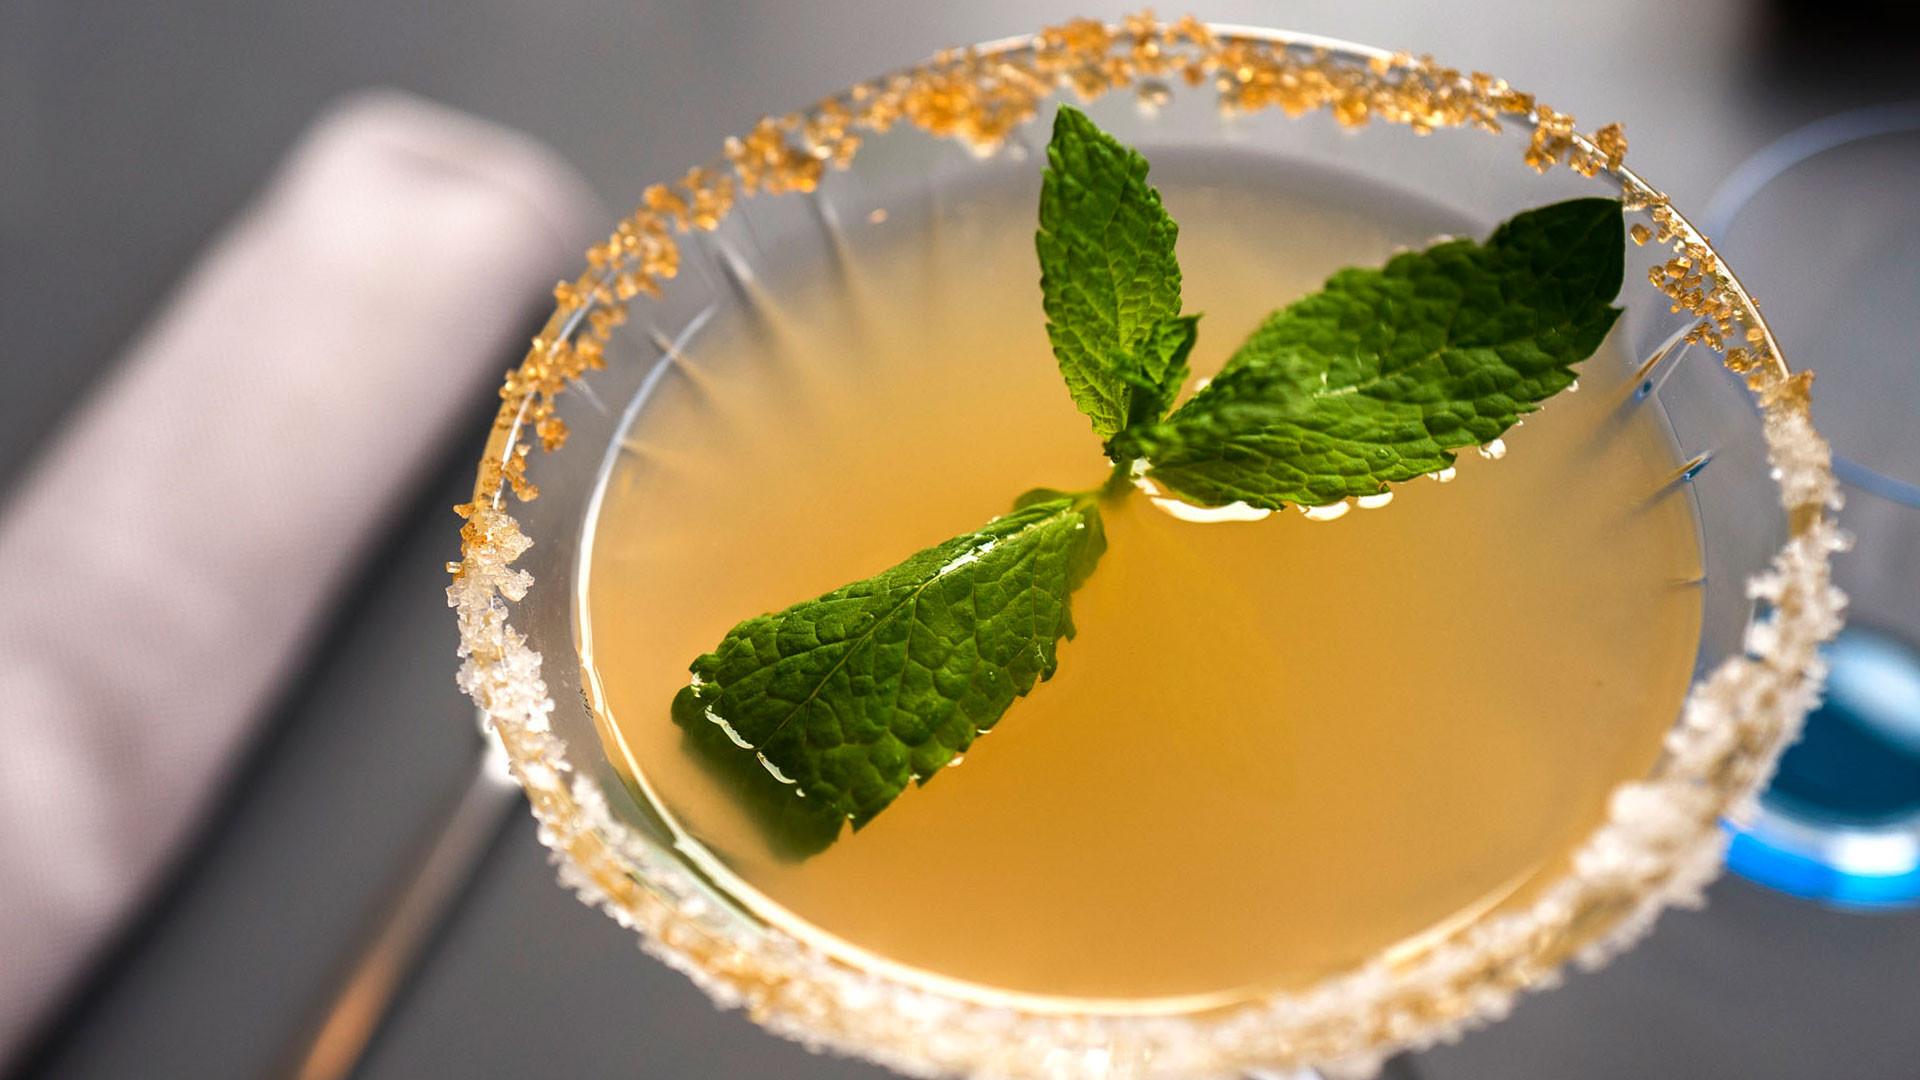 Margarita Mentha cocktail from Rigo